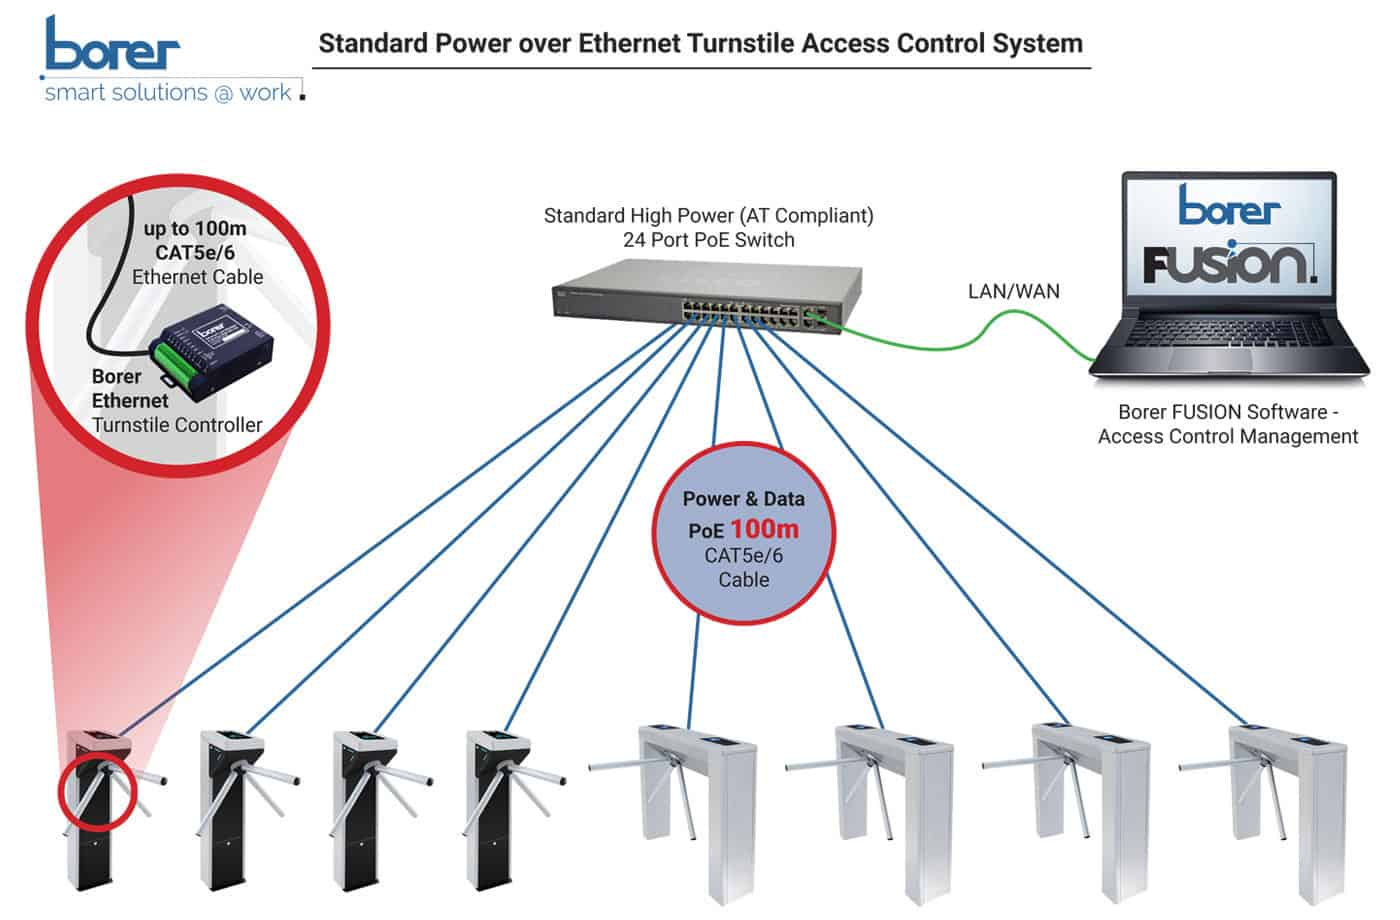 Standard PoE Turnstile Access Control System